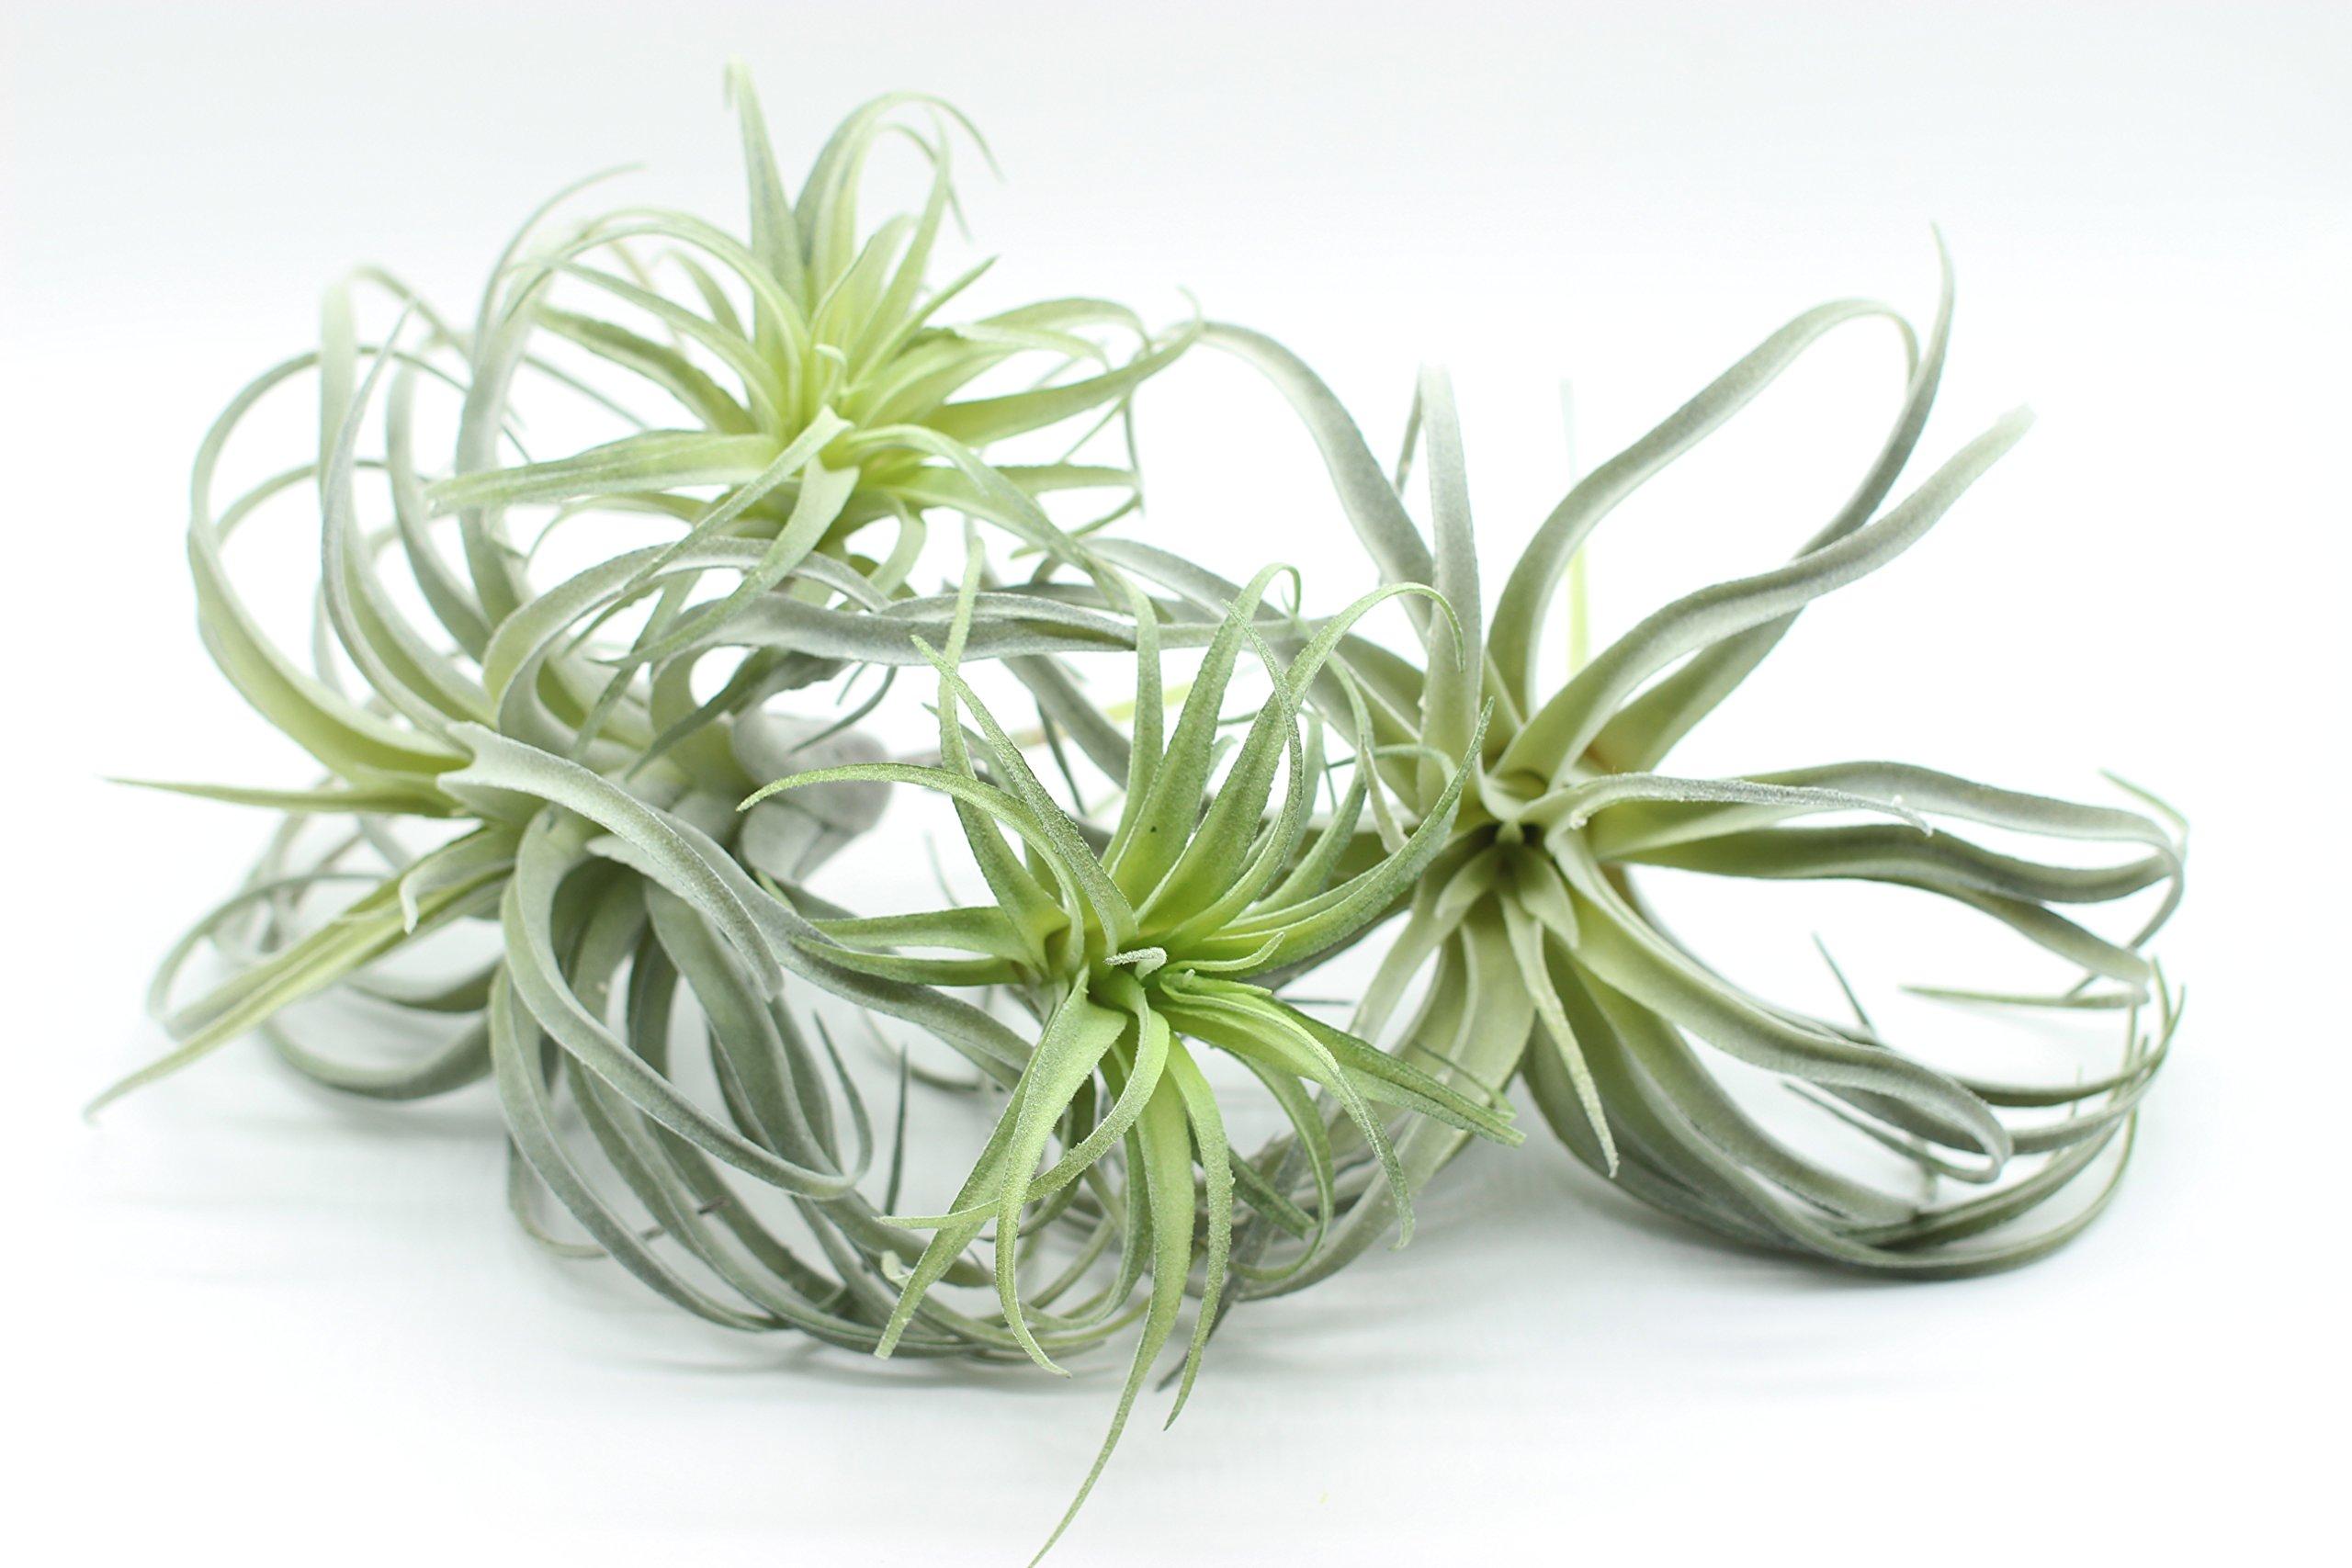 Yokoke-Artificial-Pineapple-Grass-Air-Plants-Fake-Flowers-Faux-Succulents-Flocking-Tillandsia-Bromeliads-Home-Garden-Decor-4-Pcs-11-Inches-Assortment